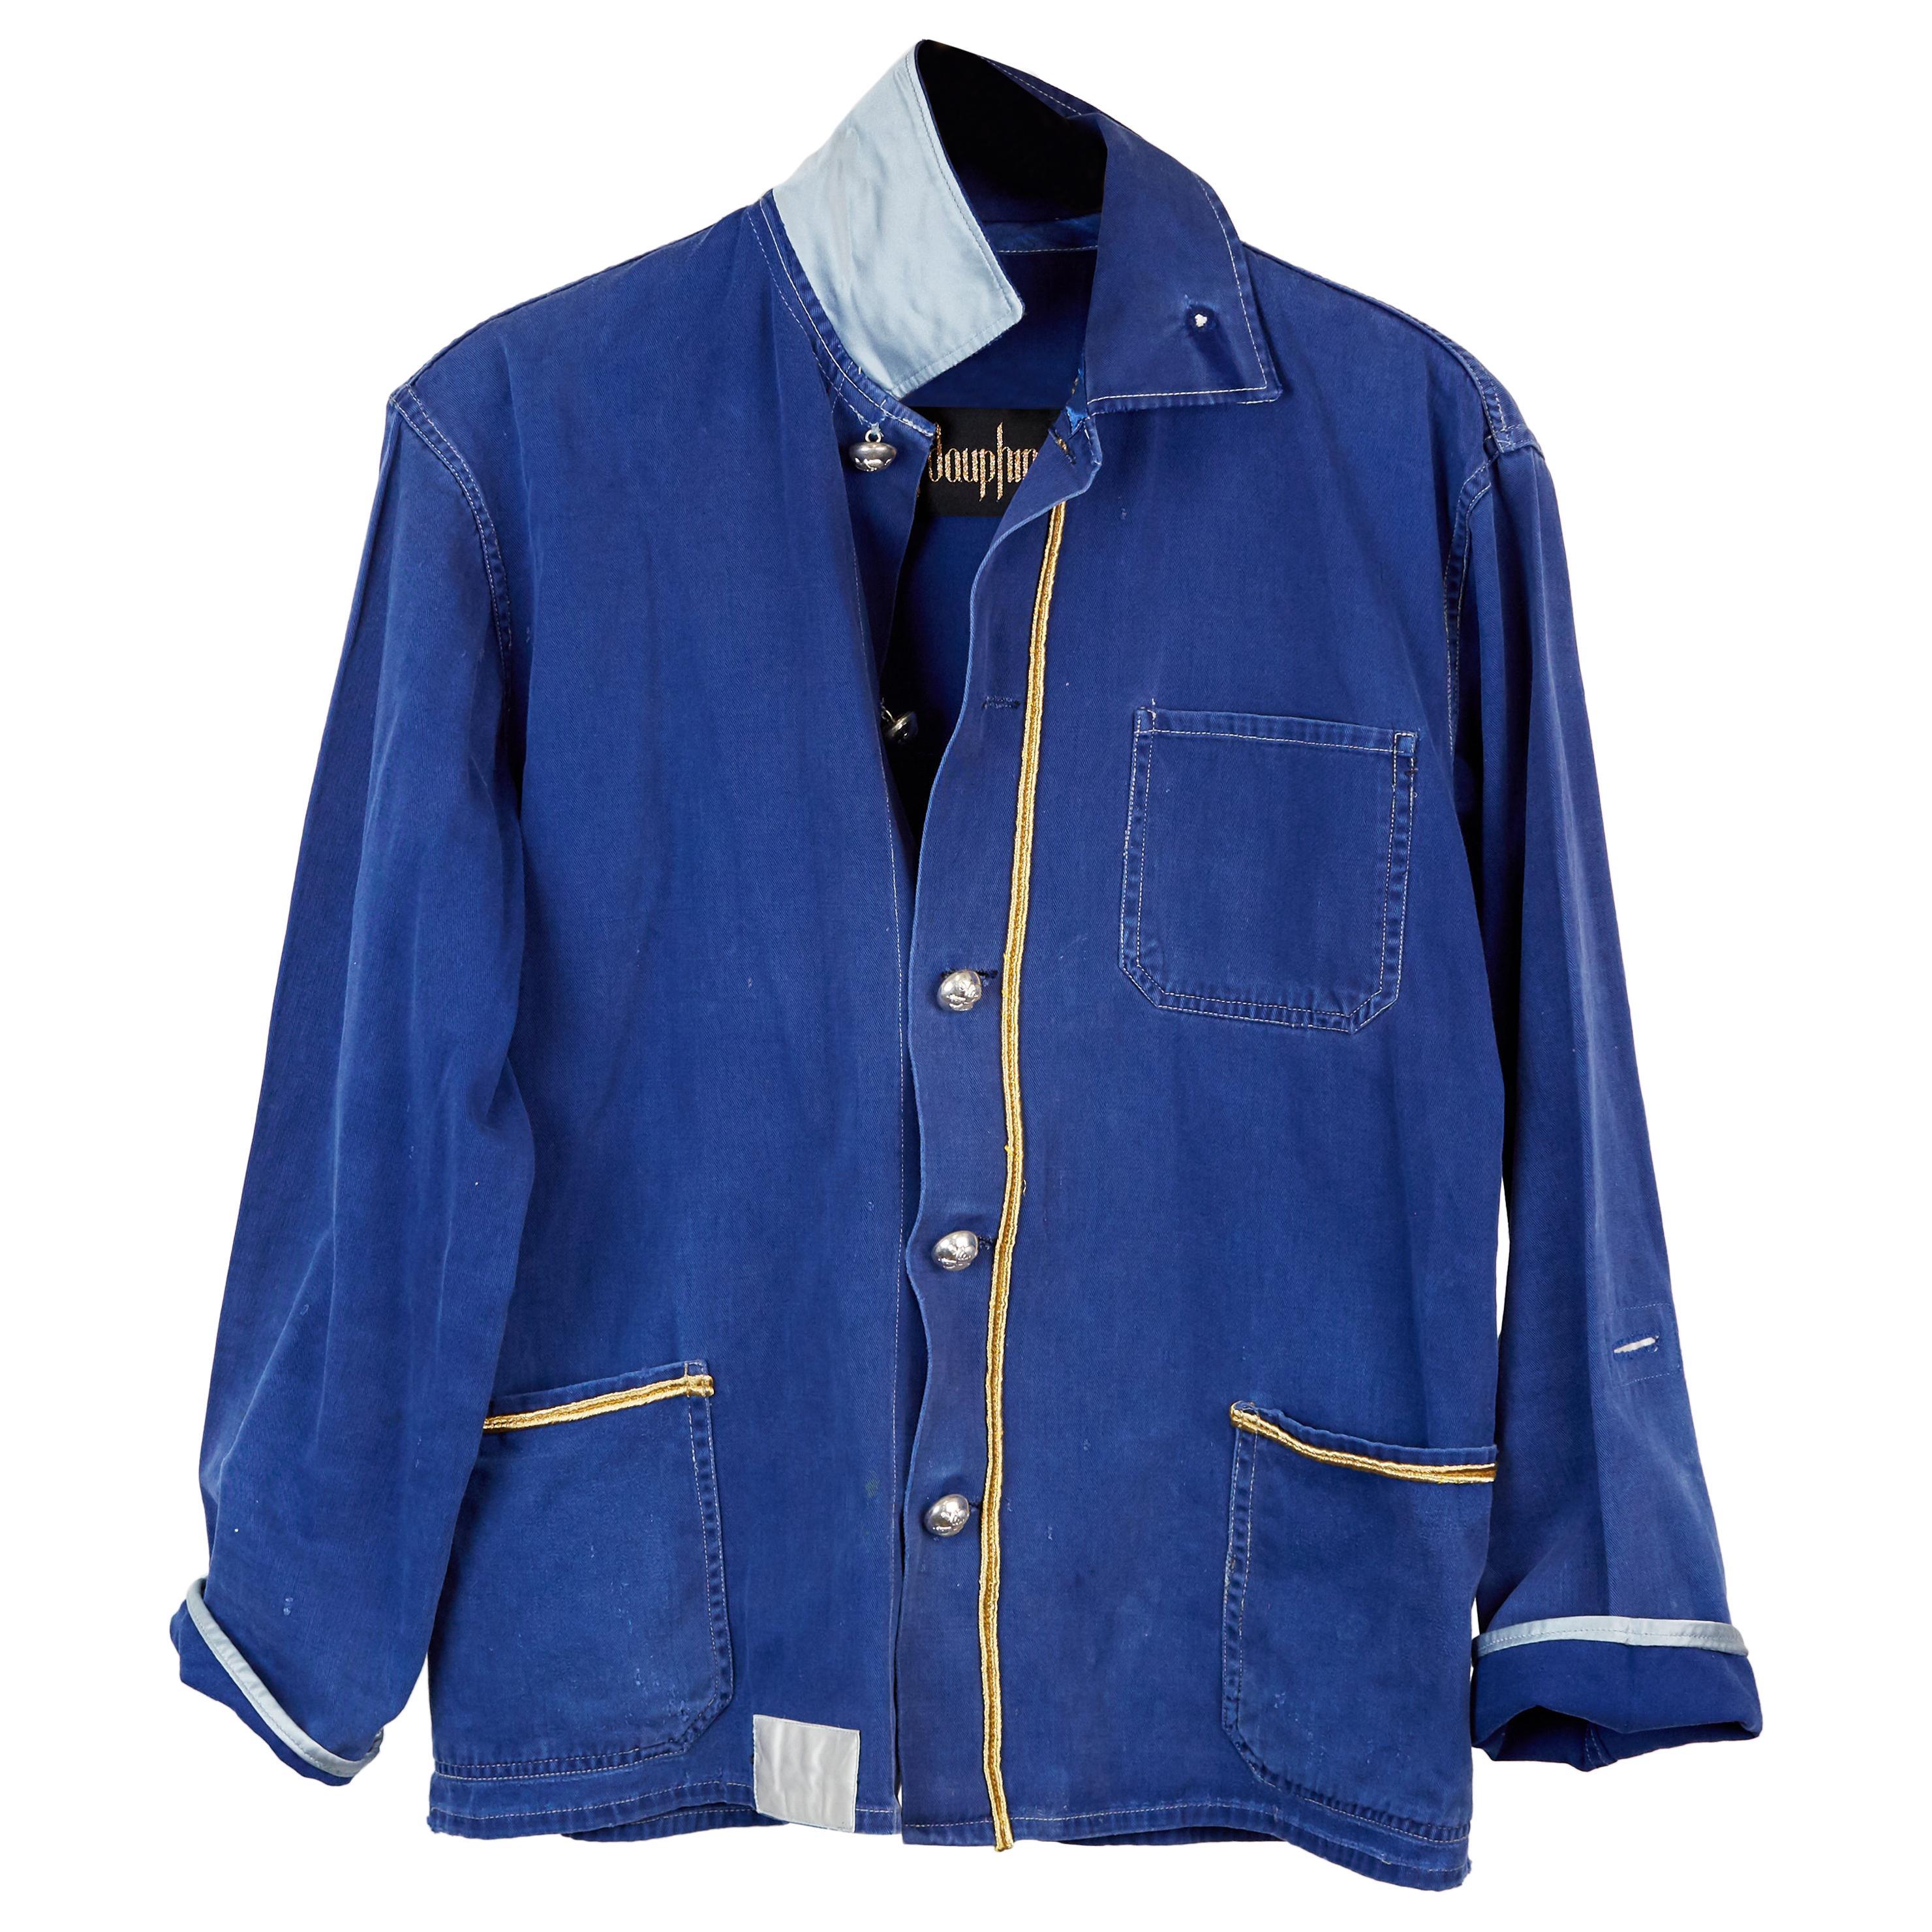 Cotton Jacket Blazer French Blue Work Jacket Embellished Gold Braid J Dauphin